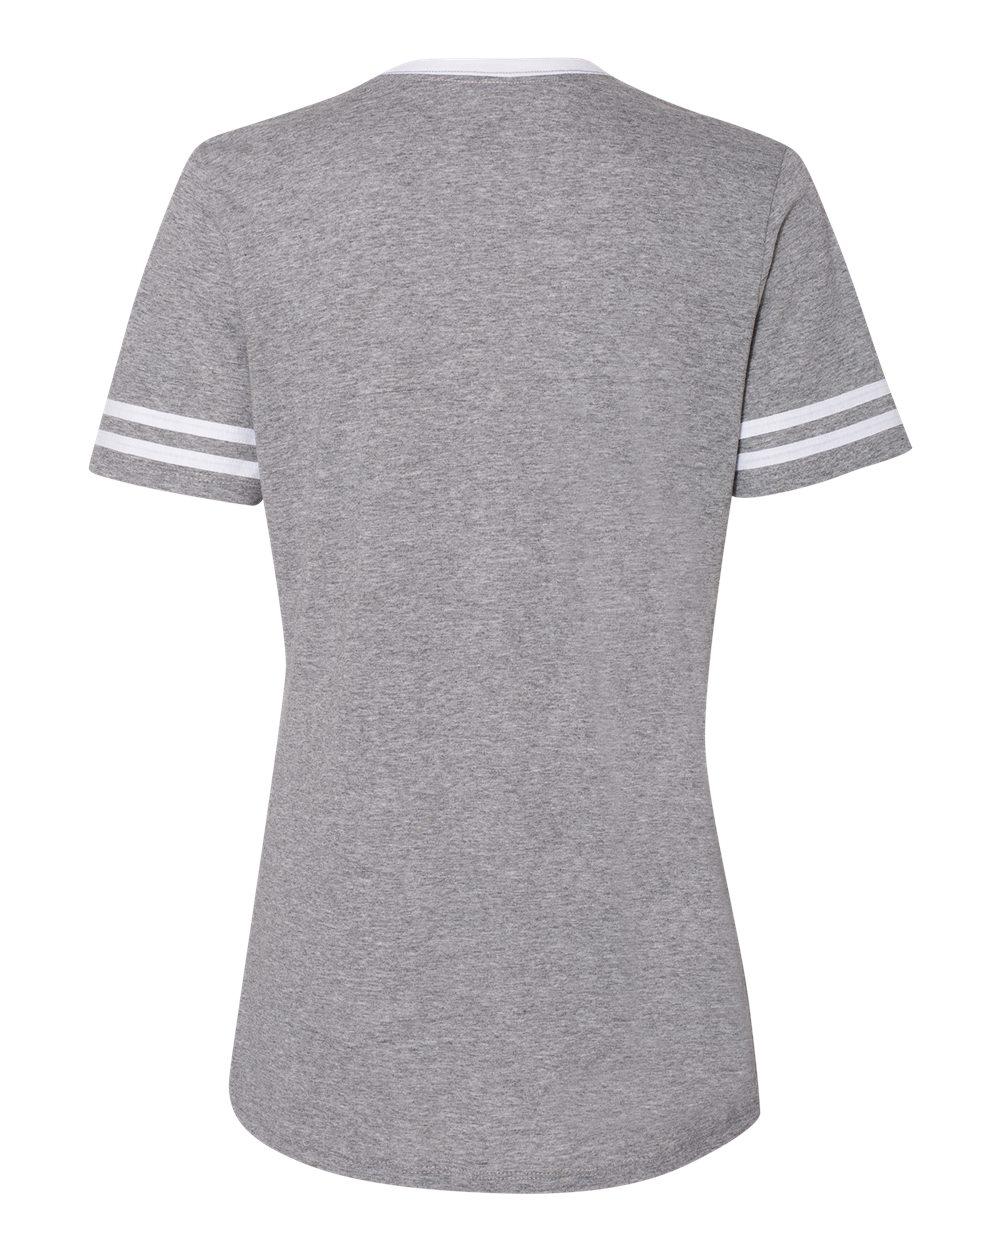 Jerzees-Triblend-Women-039-s-V-Neck-Varsity-T-Shirt-602WVR thumbnail 20